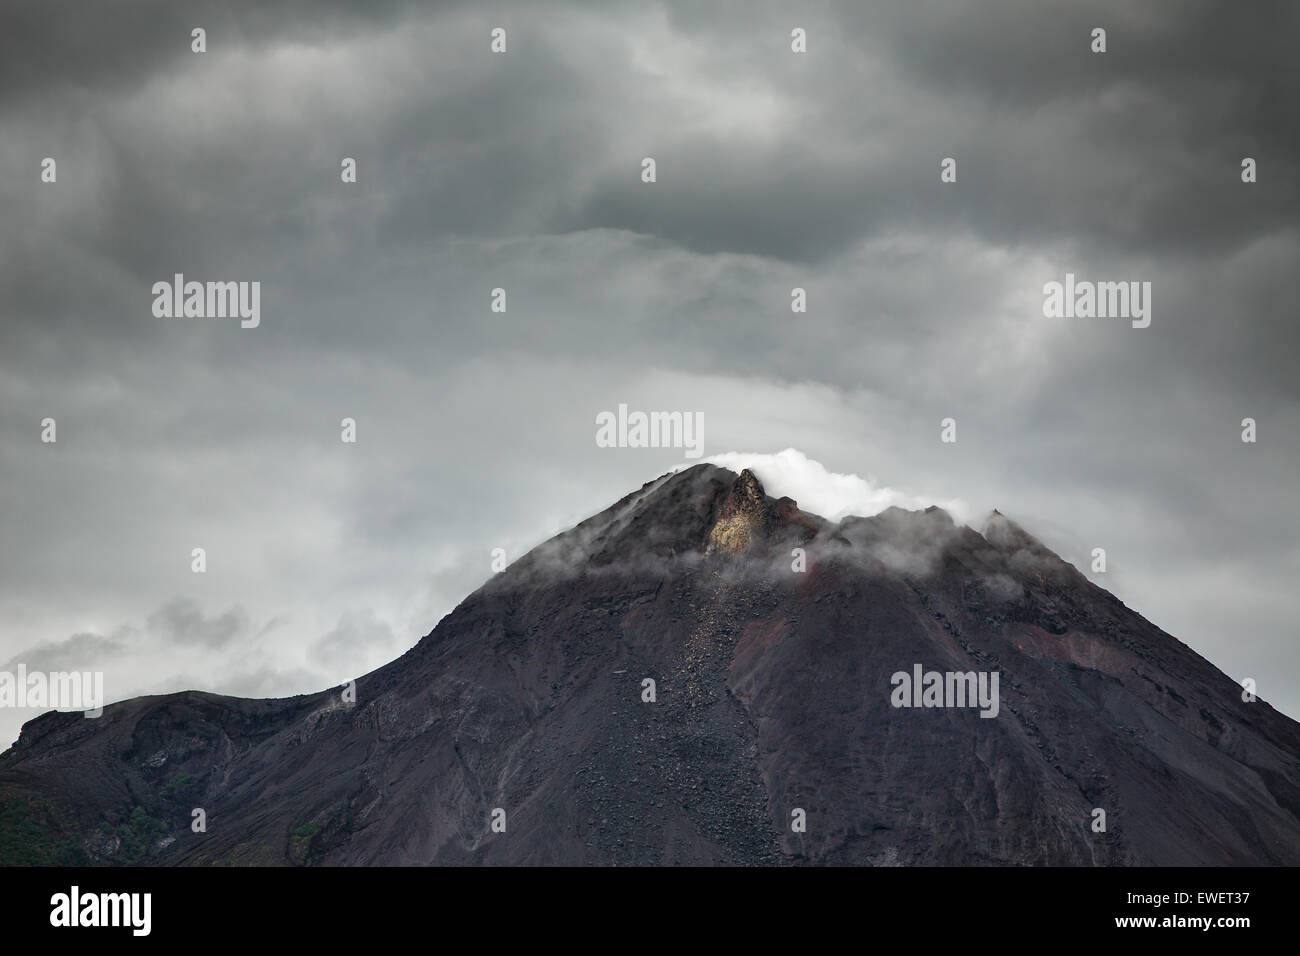 Mountain Merapi volcano, Java, Indonesia. Dramatic photo - Stock Image